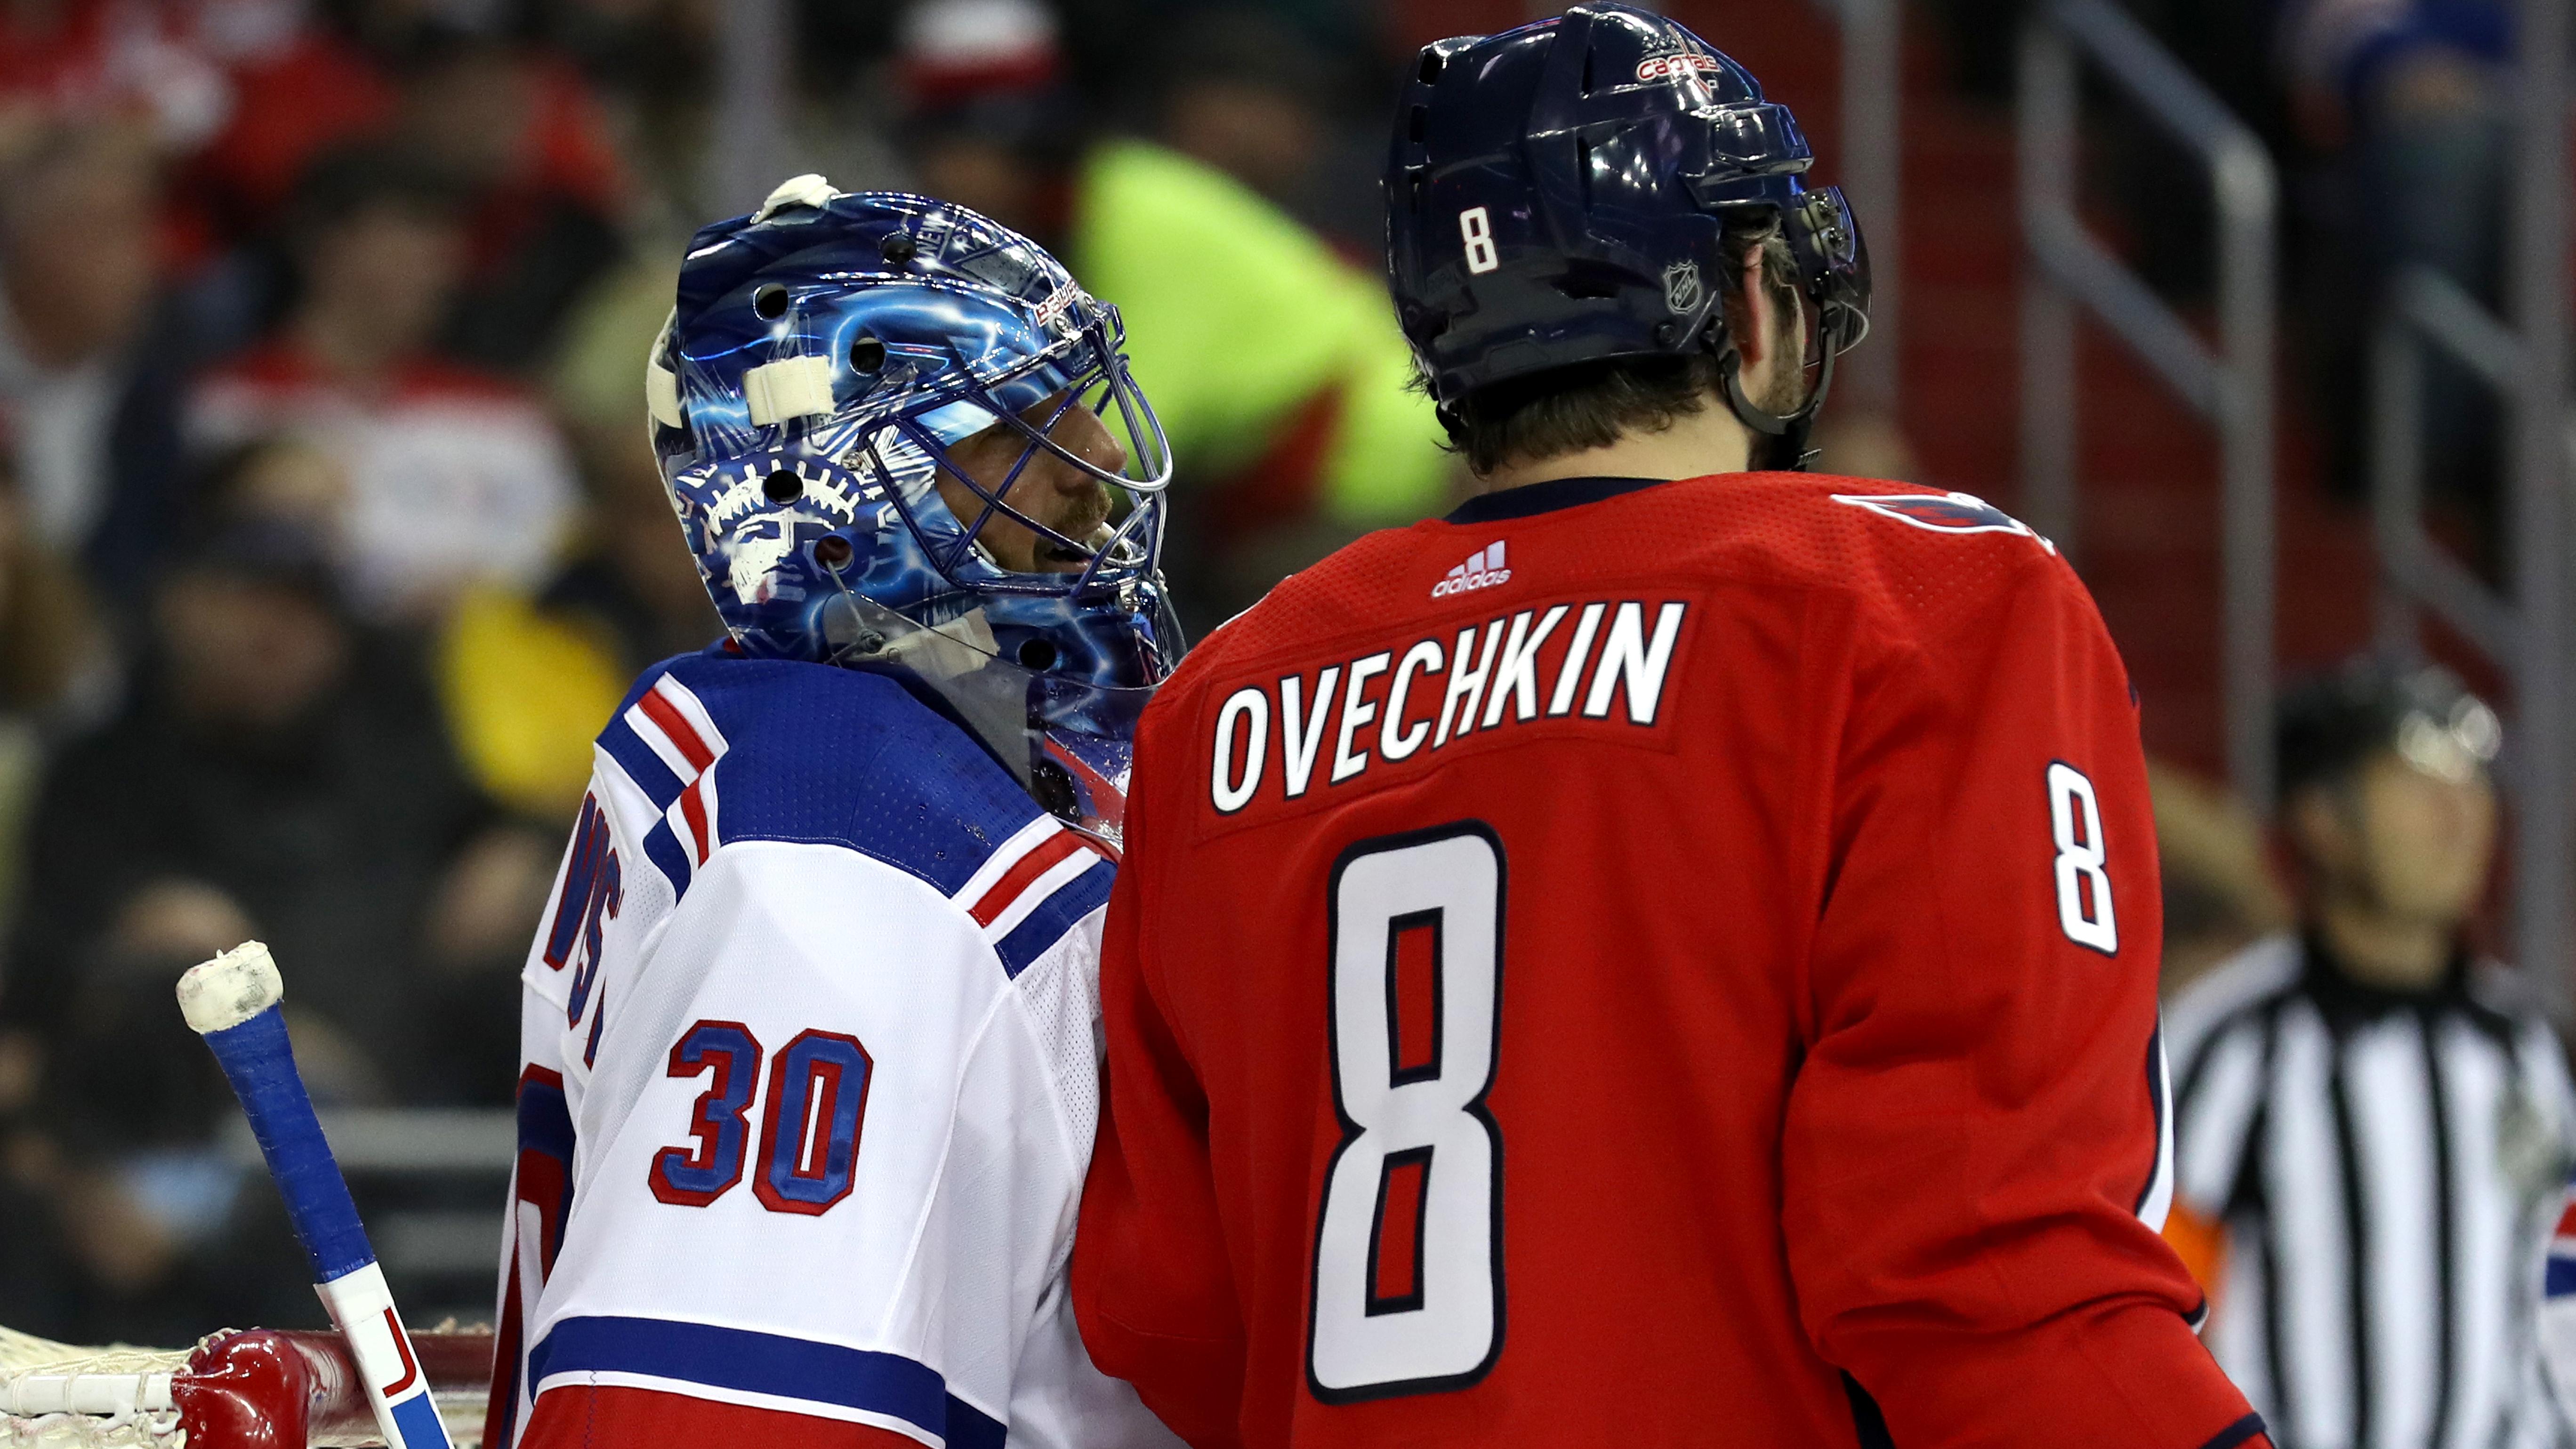 Wednesday Night Hockey preview: New York Rangers vs. Washington Capitals